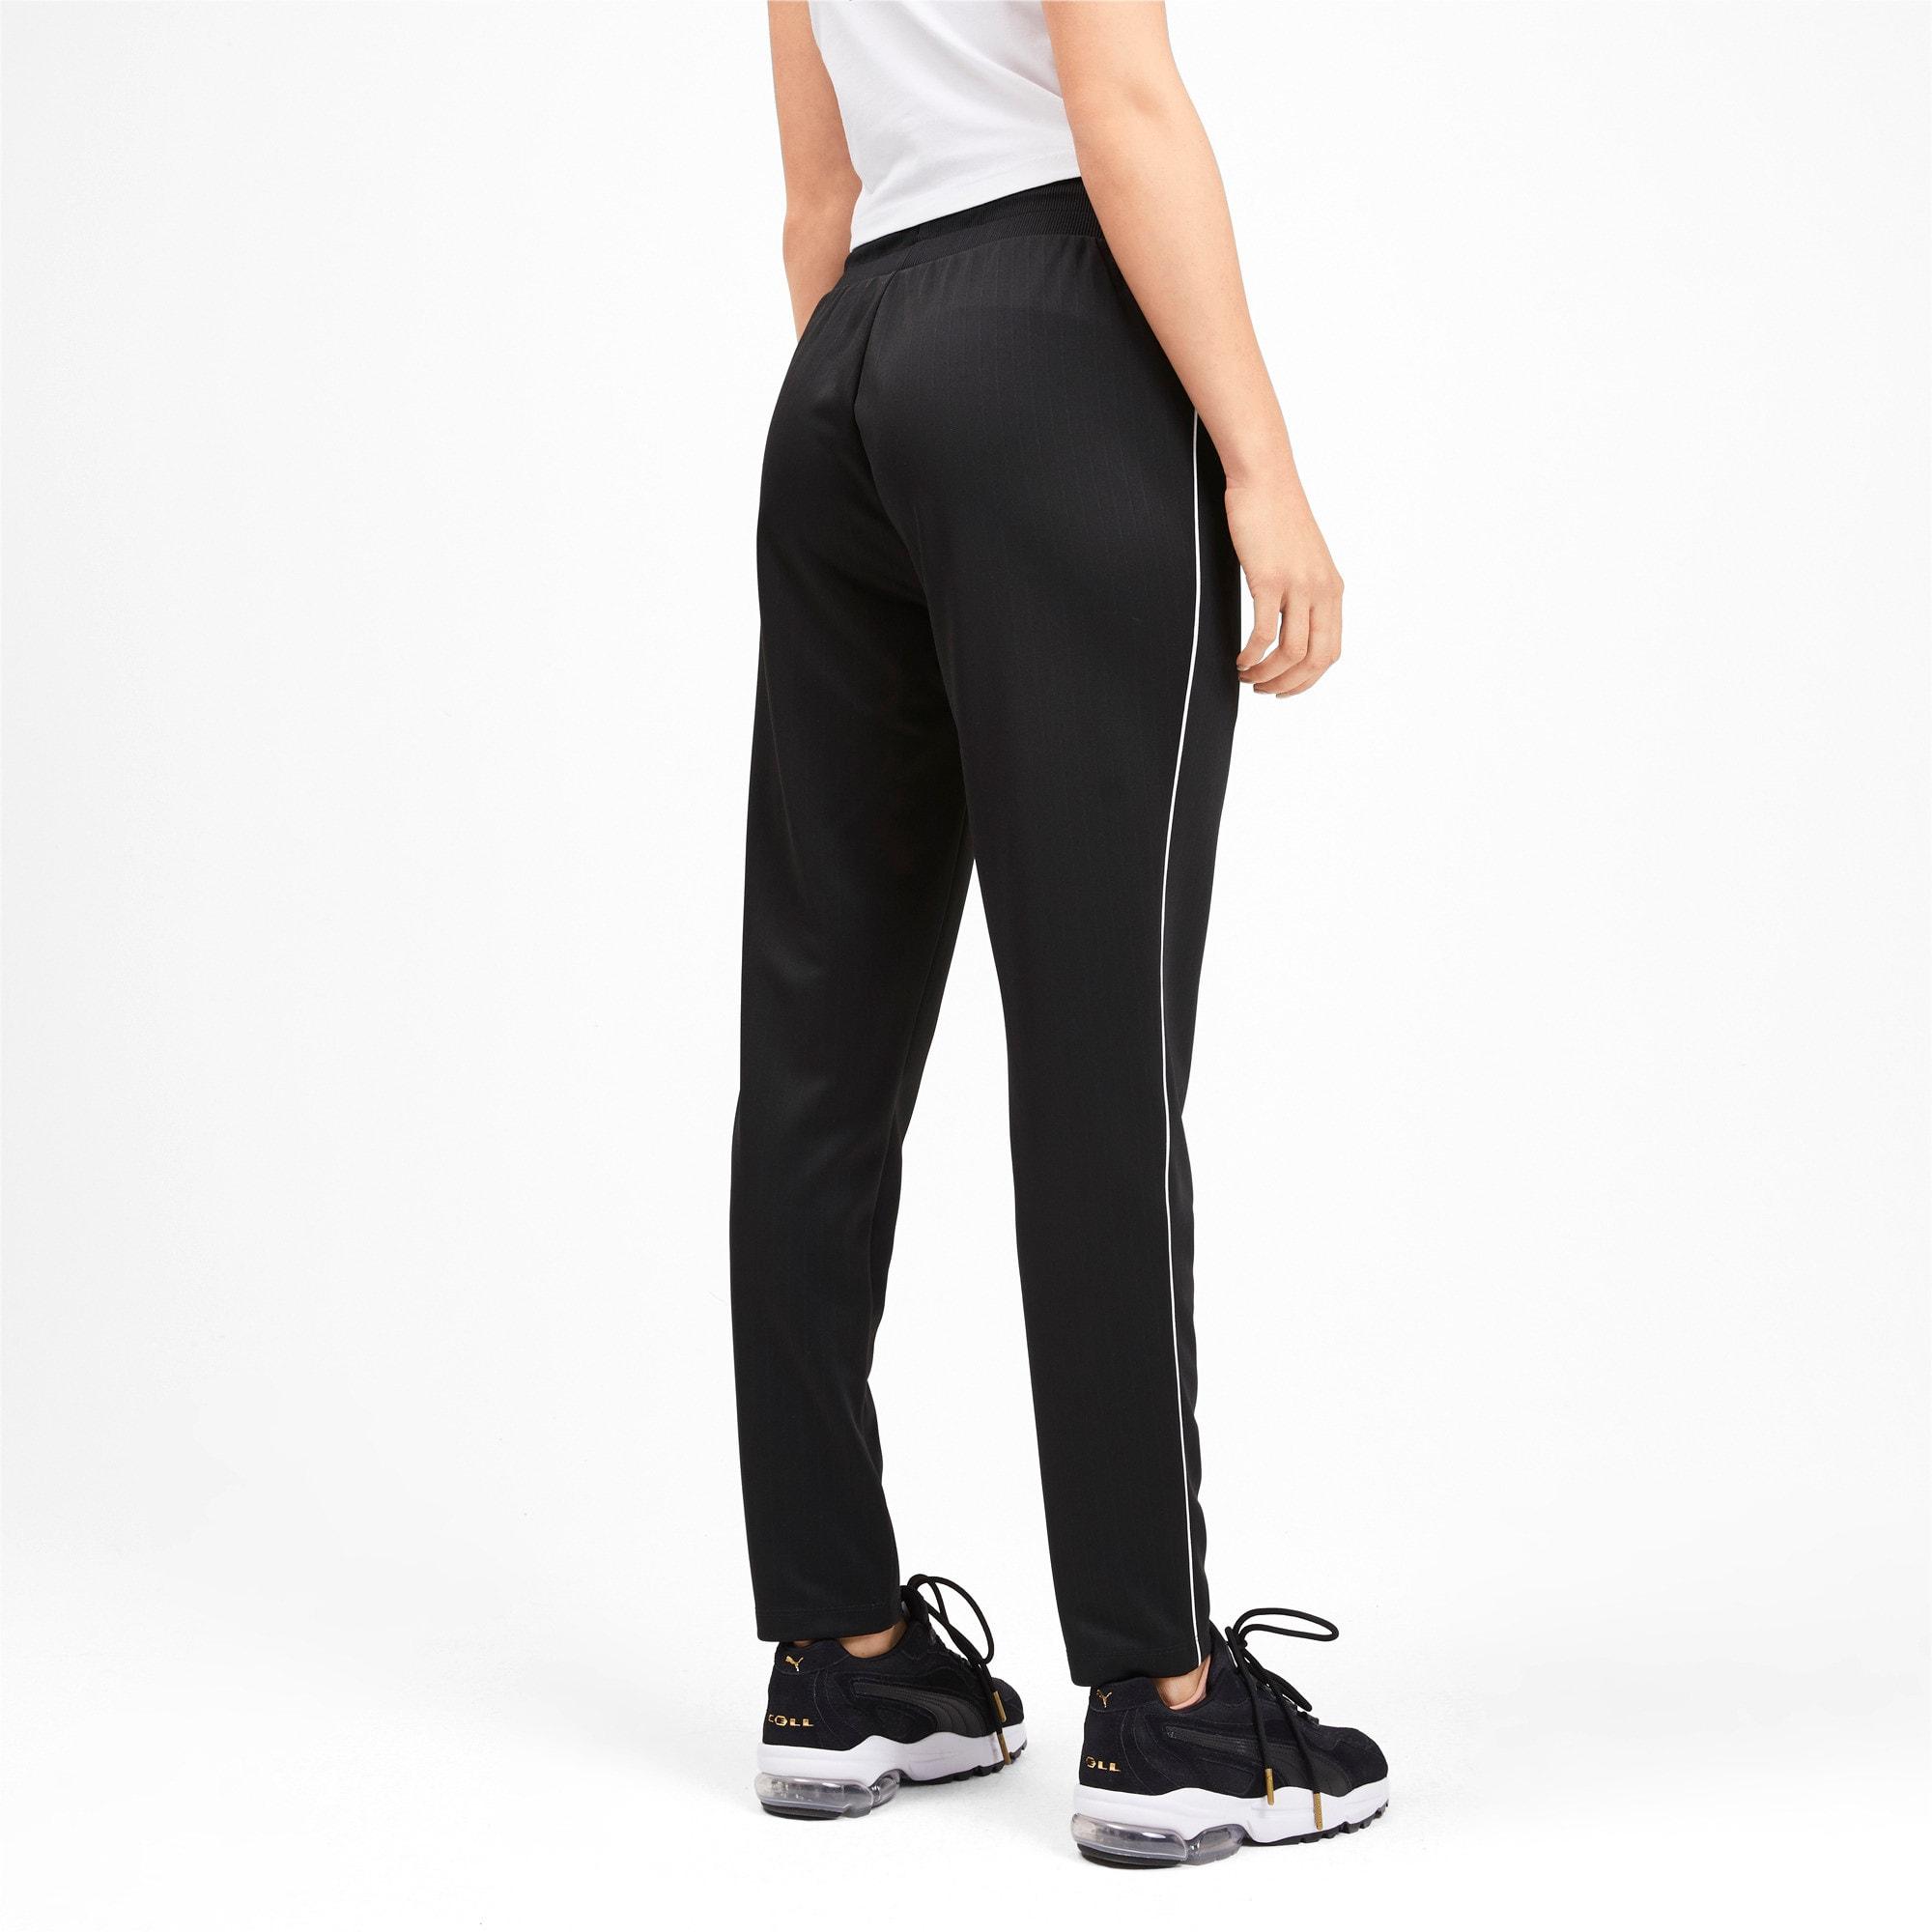 Thumbnail 3 of Classics Poly Knitted Women's Track Pants, Puma Black, medium